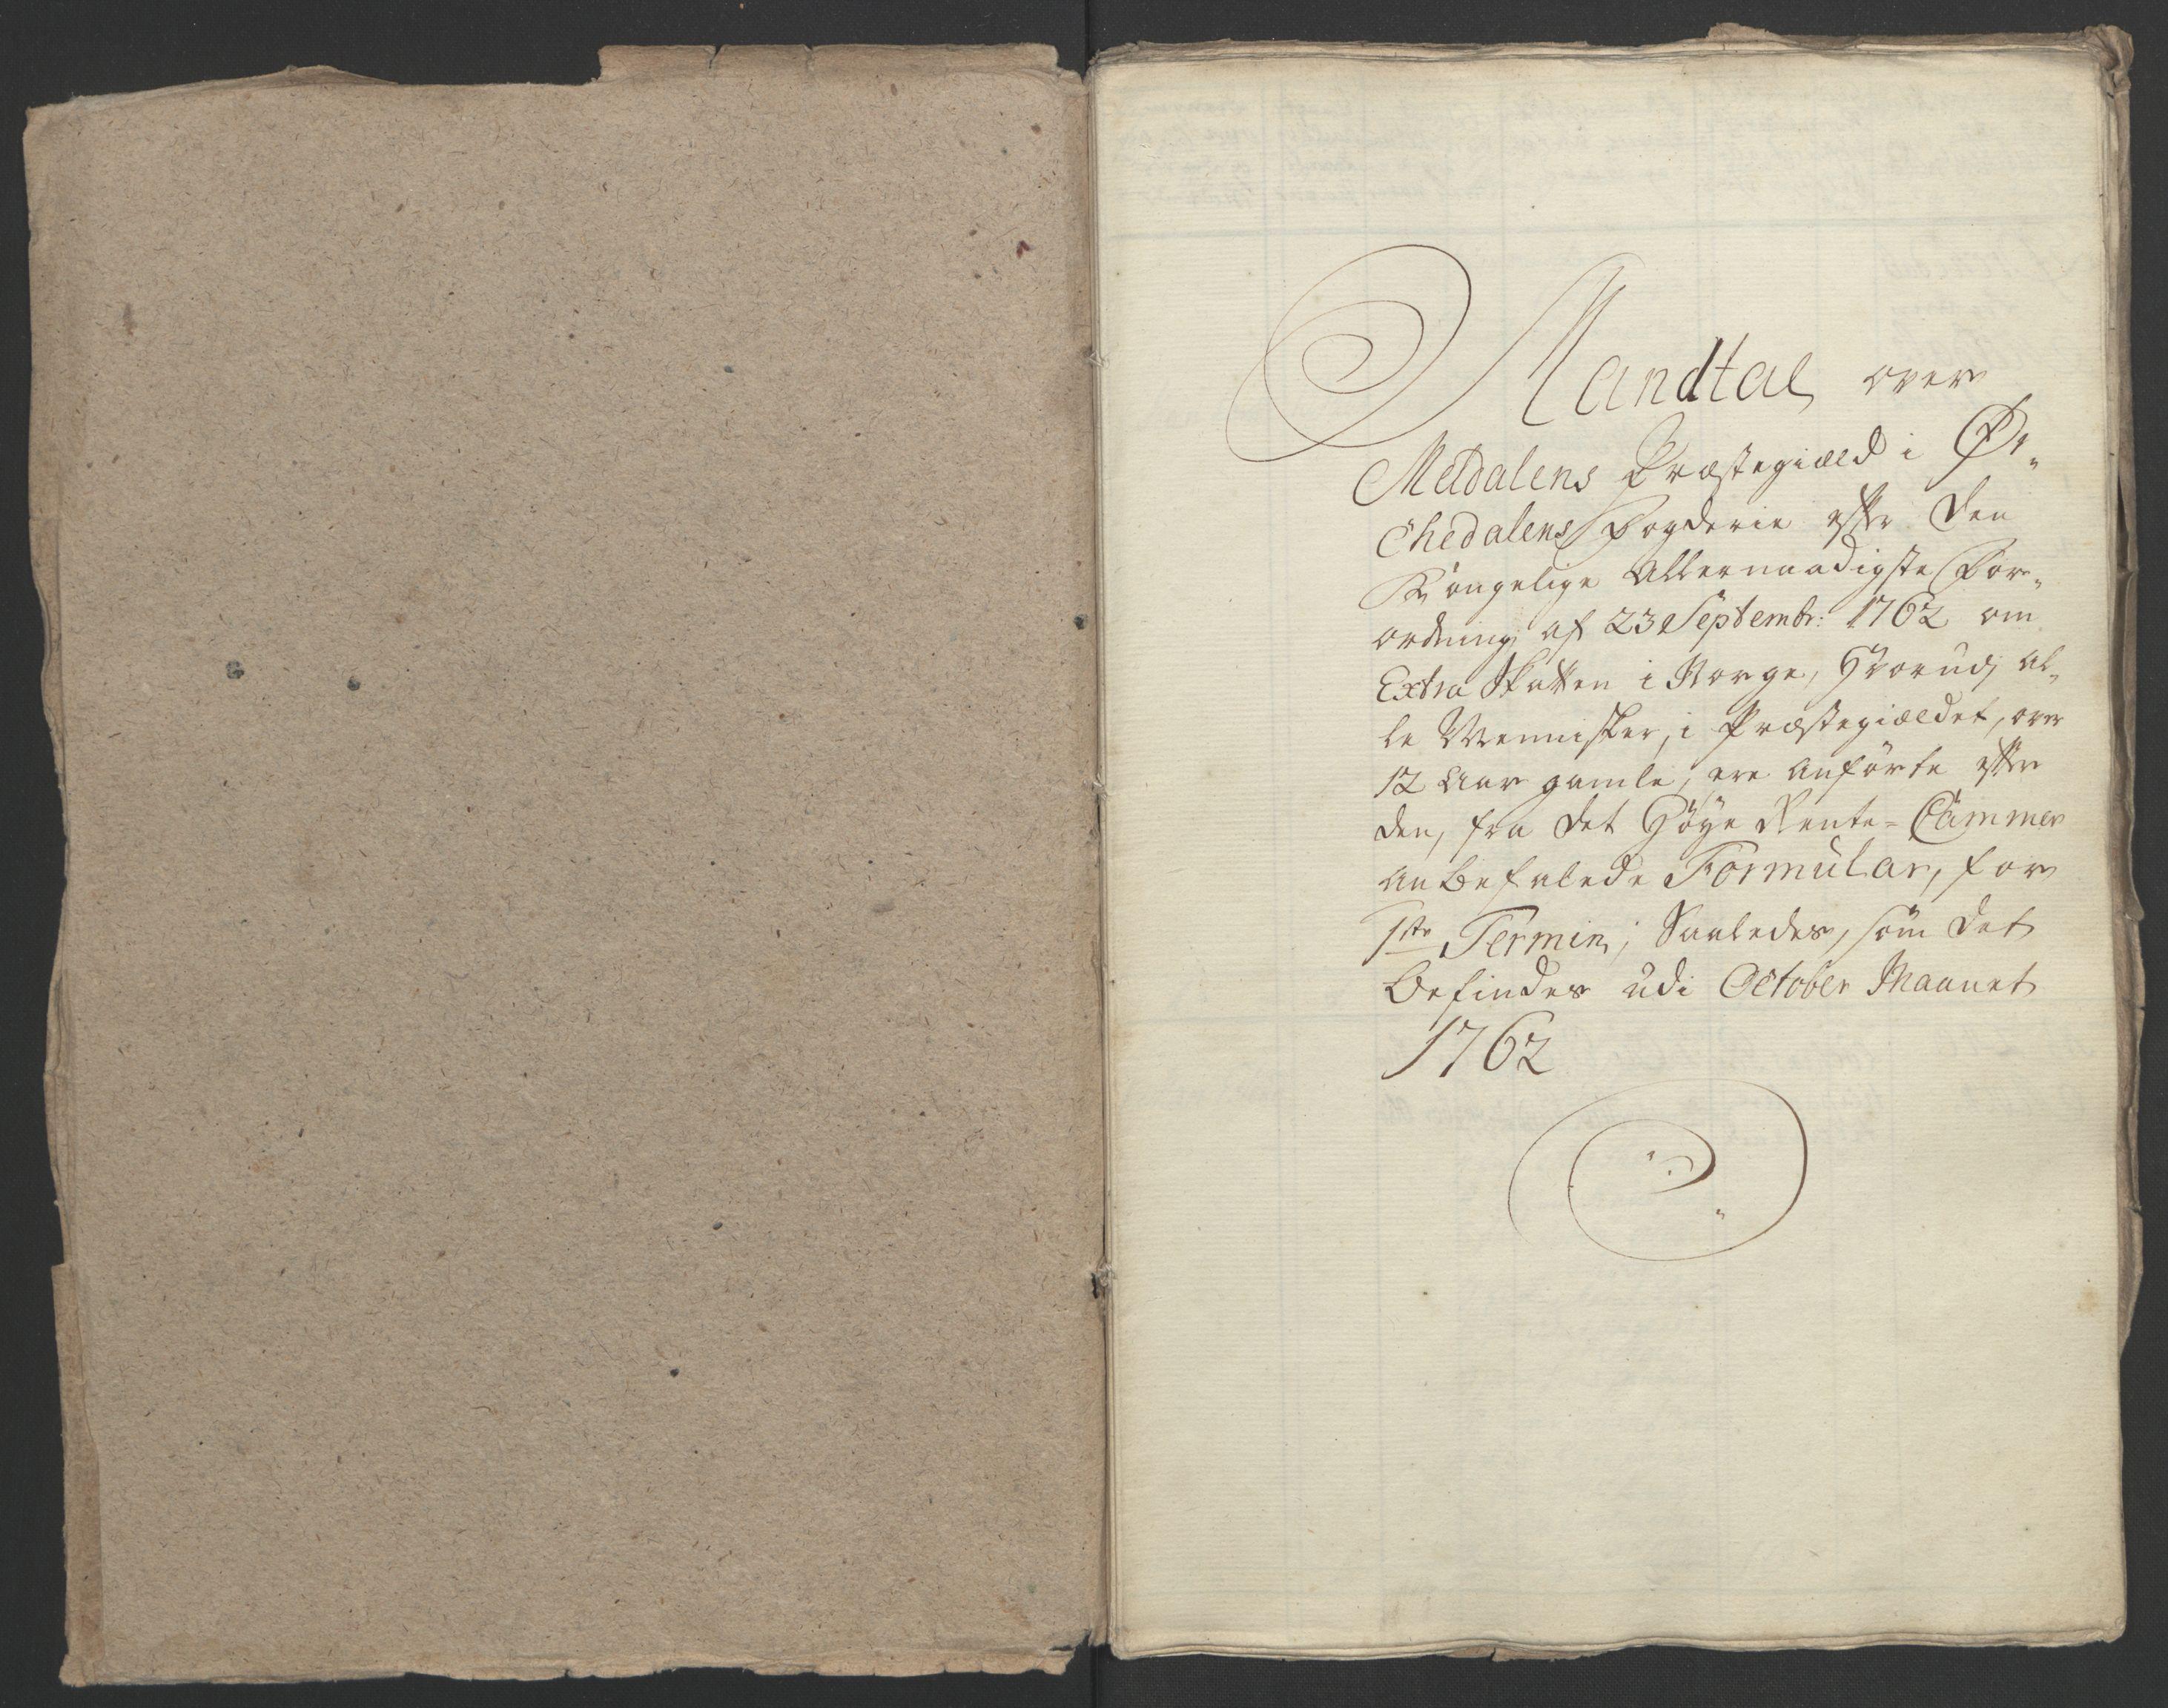 RA, Rentekammeret inntil 1814, Realistisk ordnet avdeling, Ol/L0021: [Gg 10]: Ekstraskatten, 23.09.1762. Orkdal og Gauldal, 1762-1767, s. 80